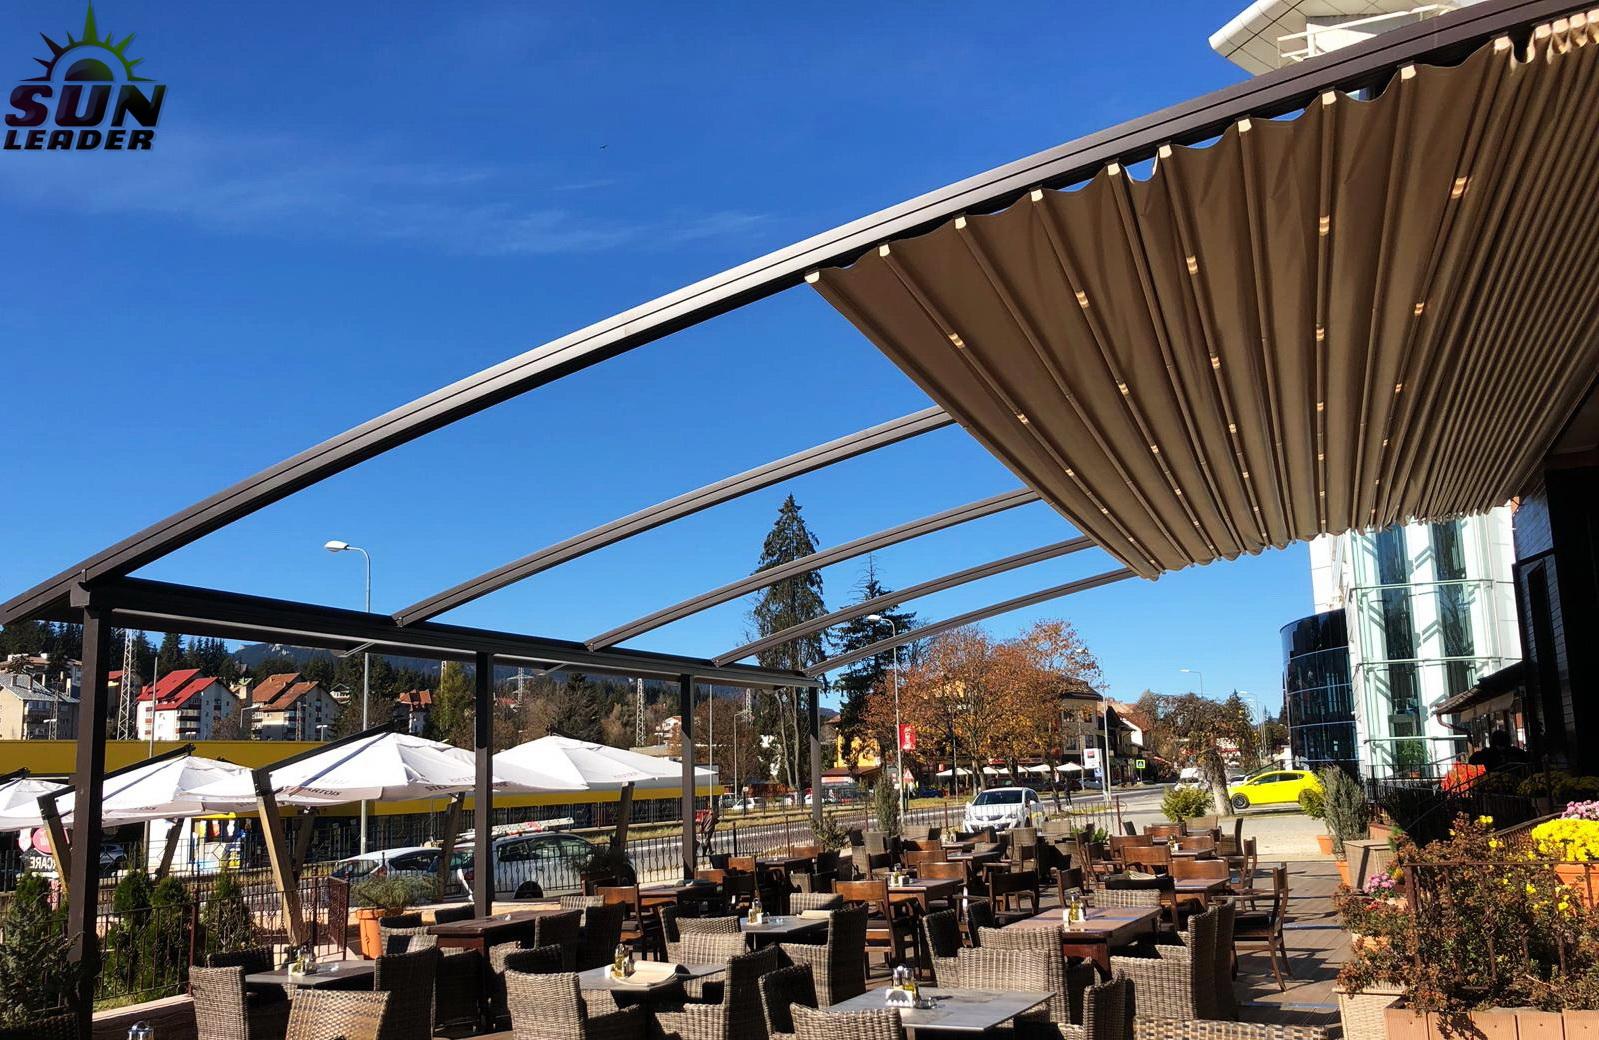 Pergola cu acoperis retractabil Spline, Pergole elegante pentru terase de restaurant. Sun Leader